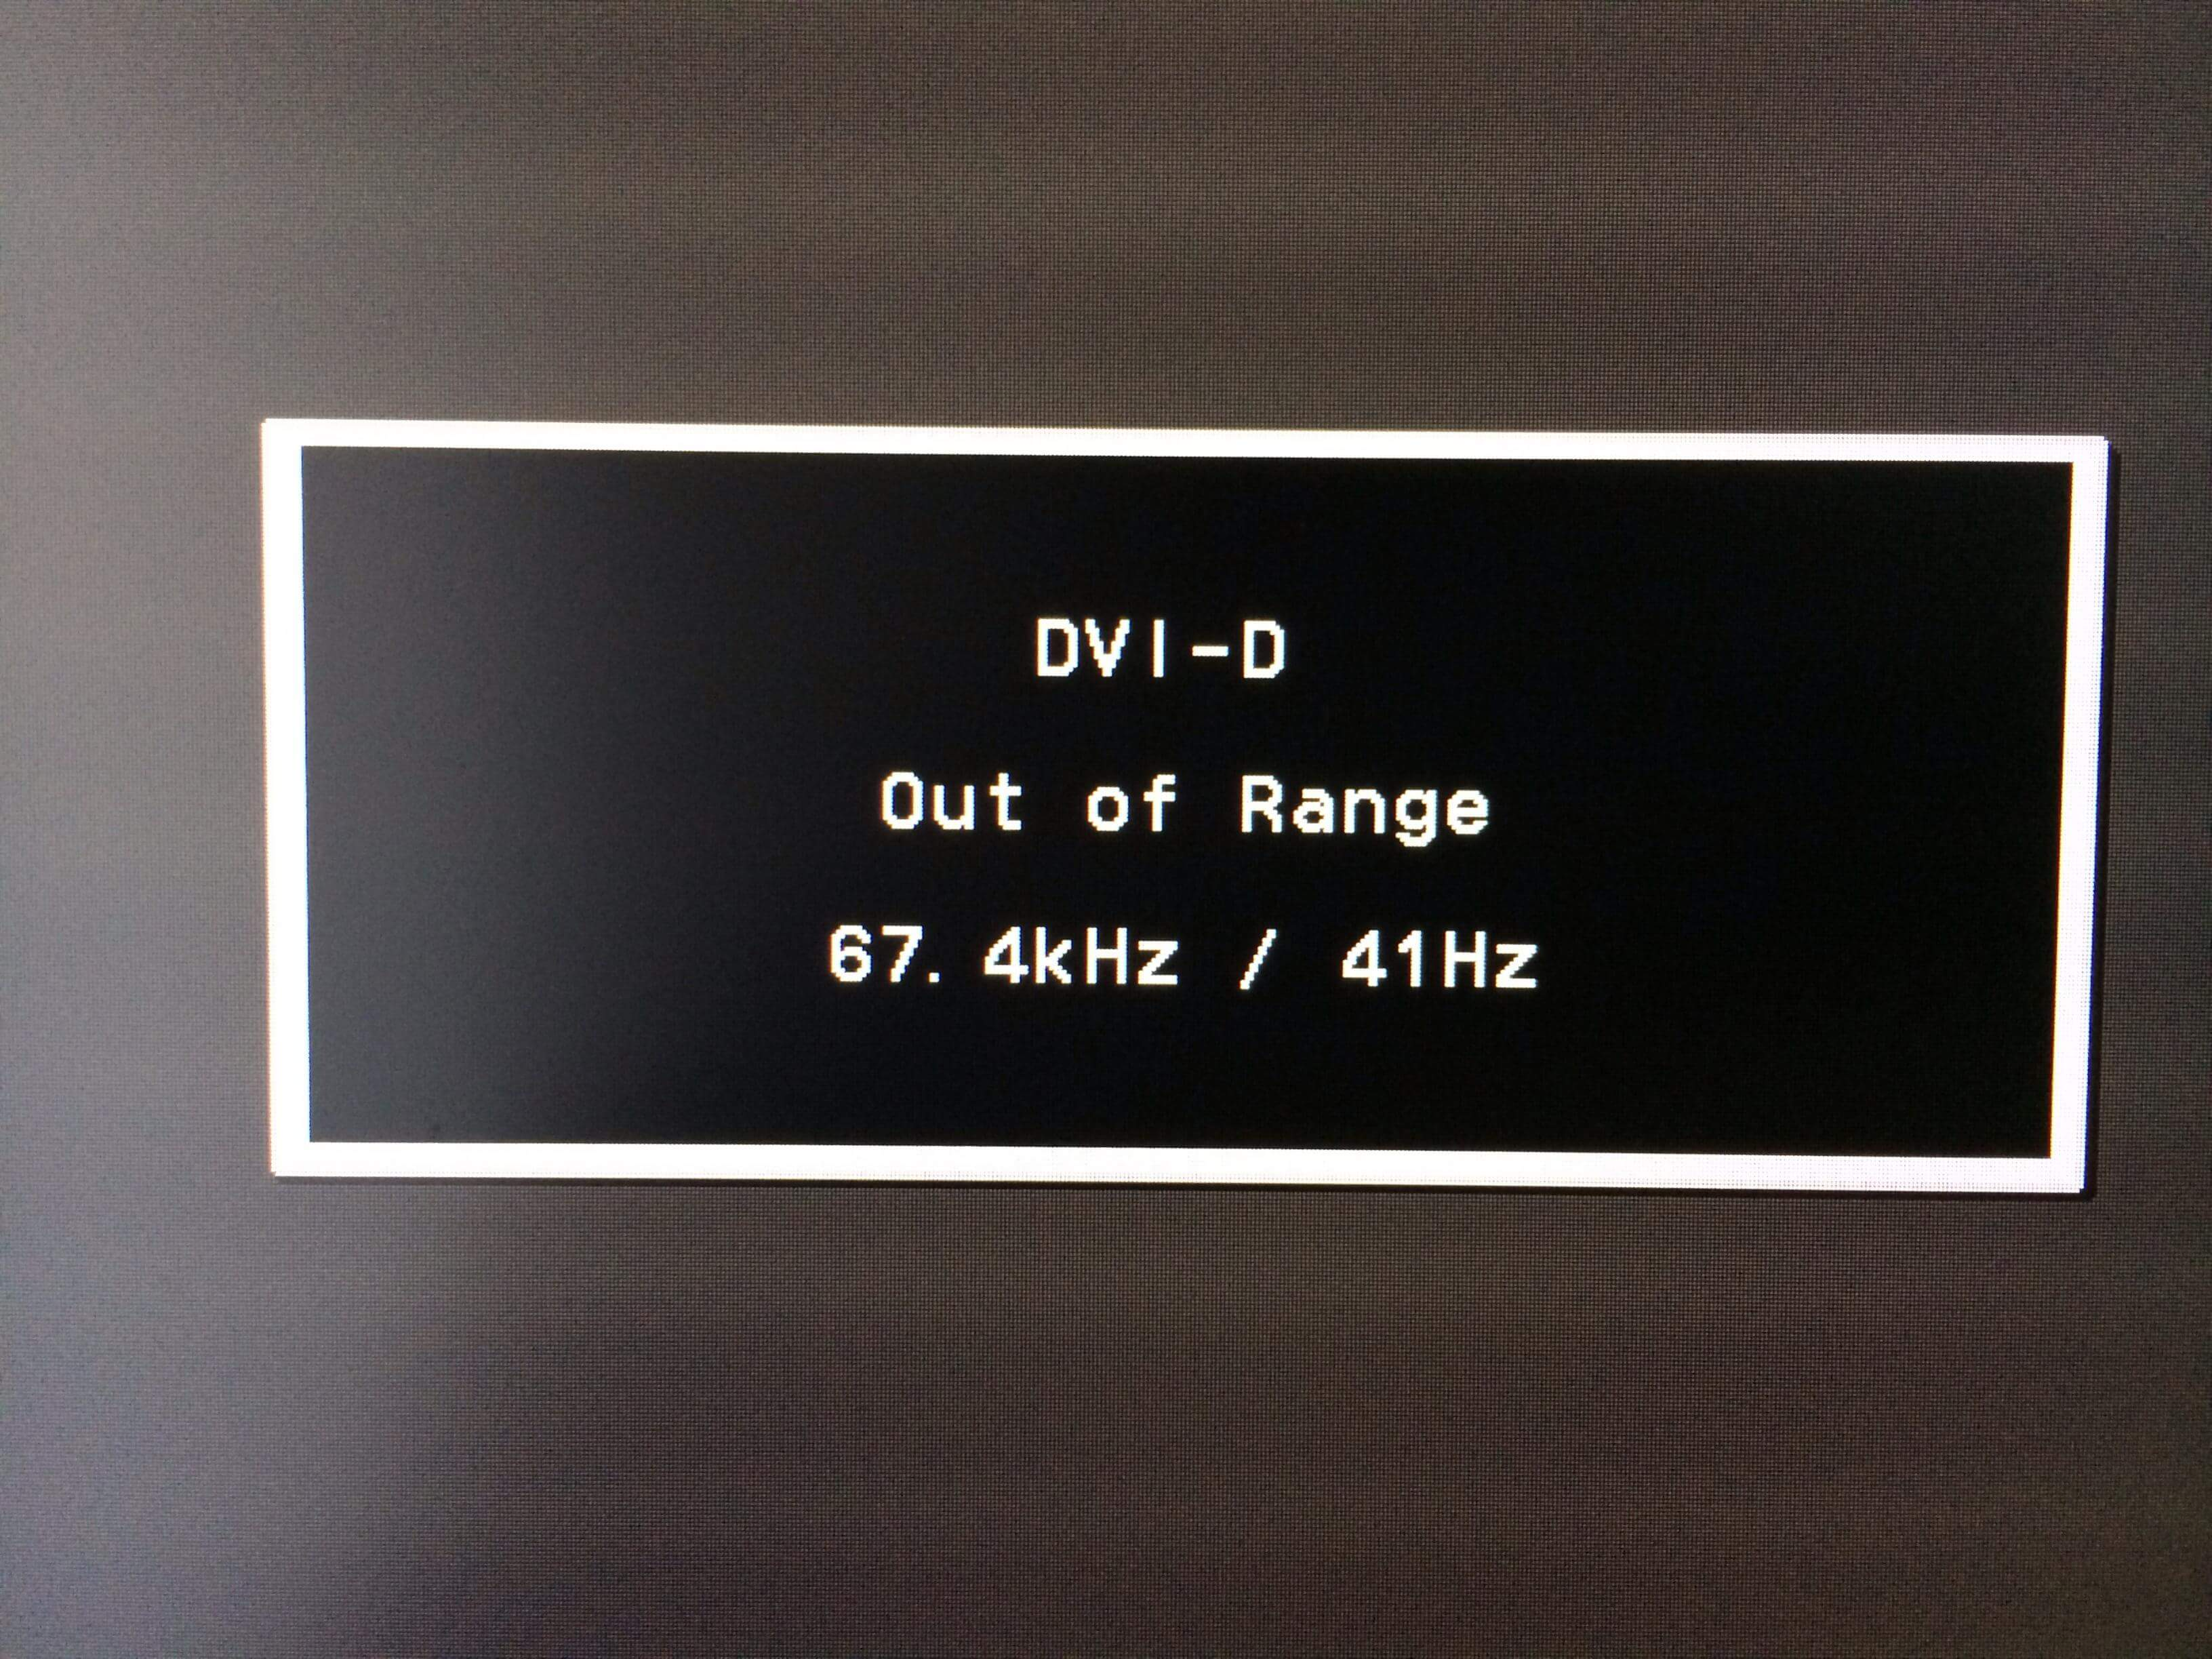 Out Of Range Ne Demek Out Of Range Monitör Hatası Çözümü Out Of Range Monitör Hatası Çözümü out of range